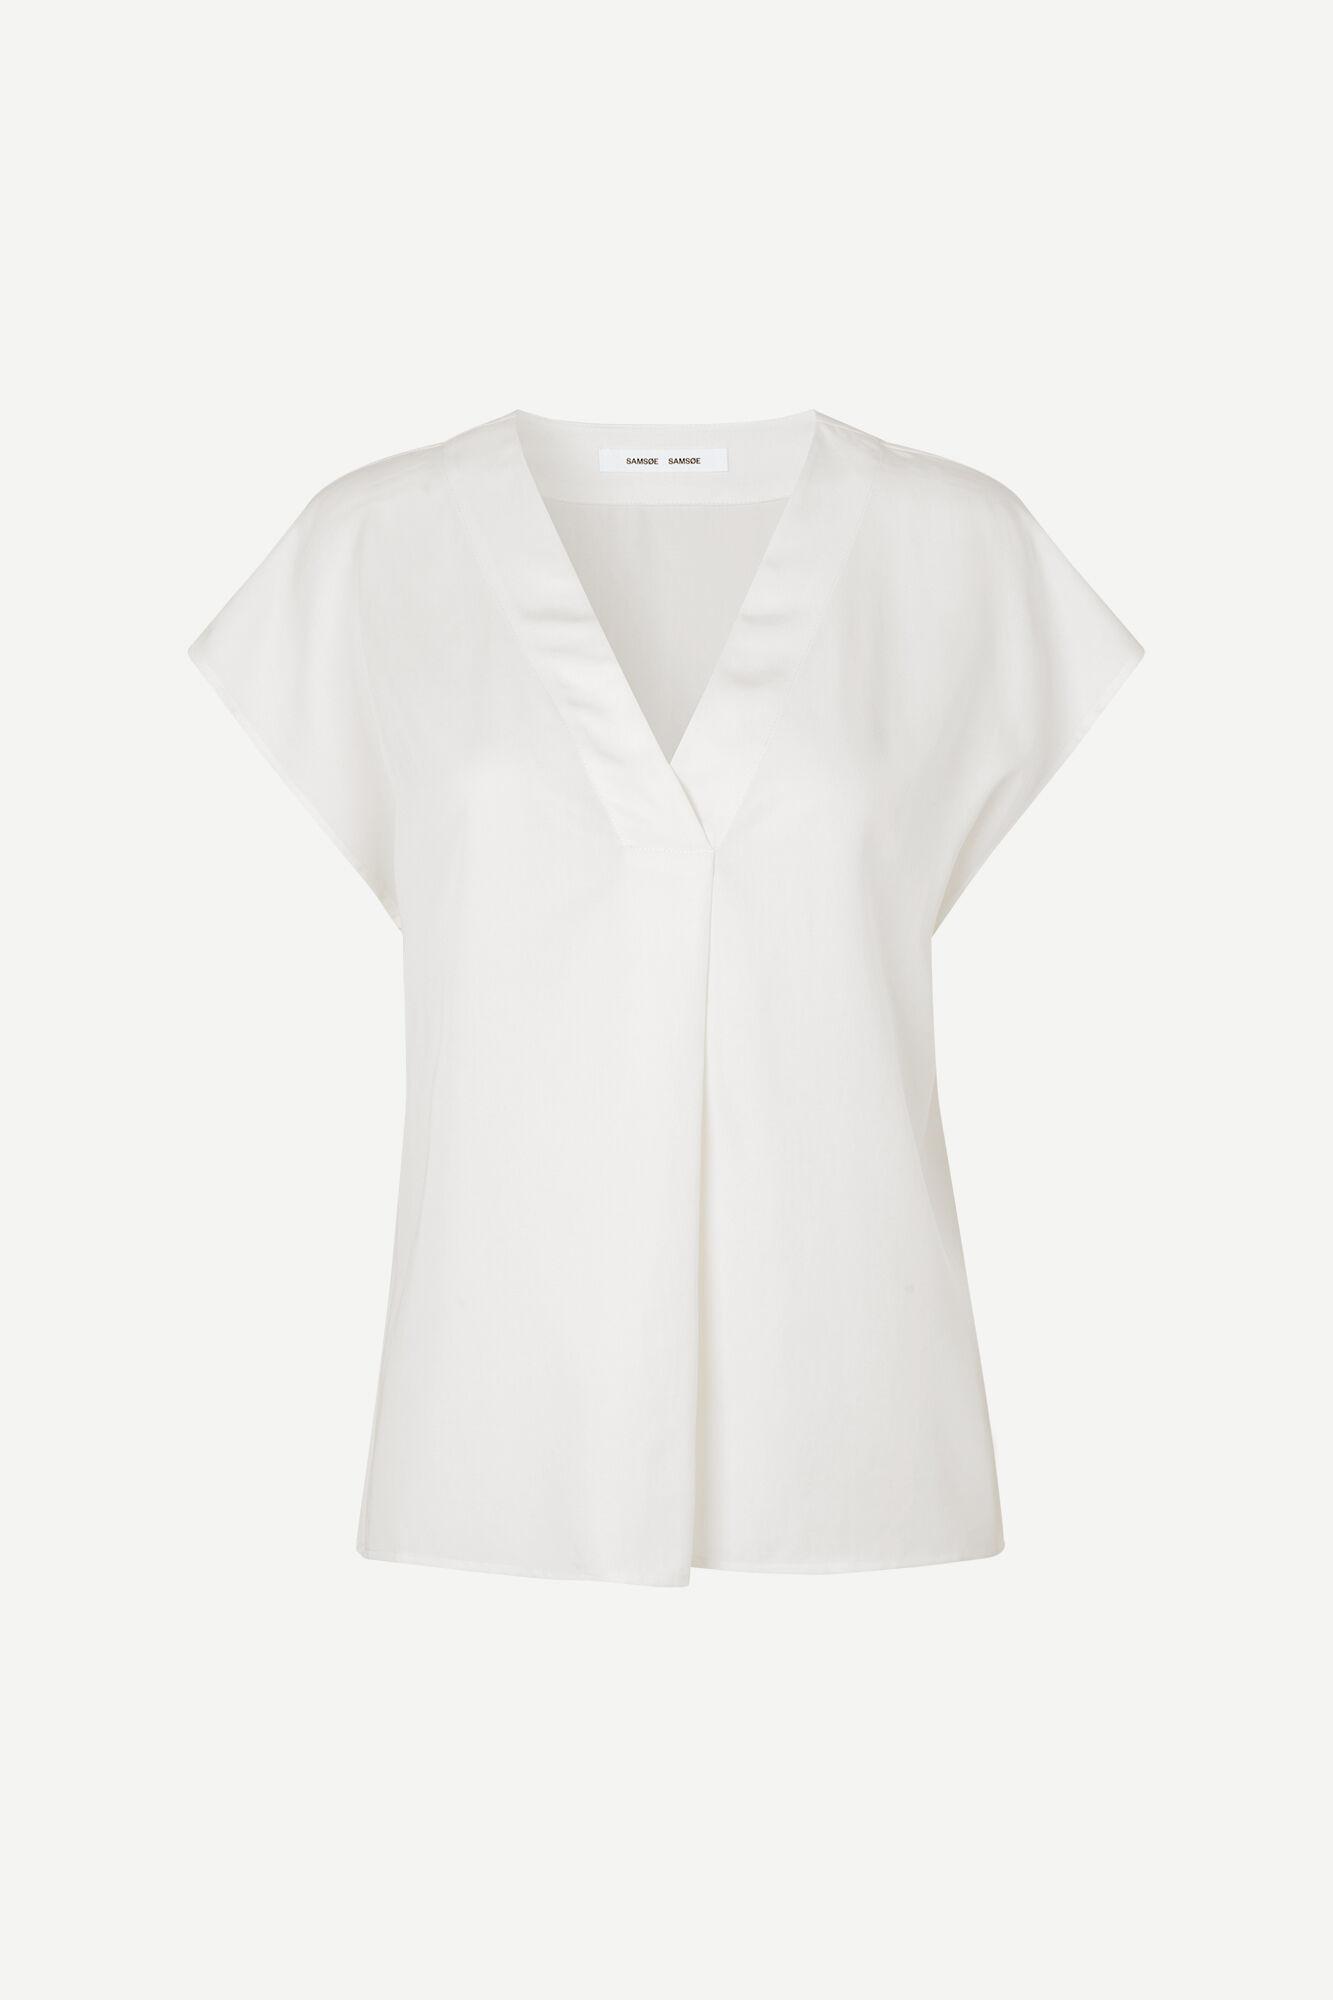 Himill ss blouse 14028